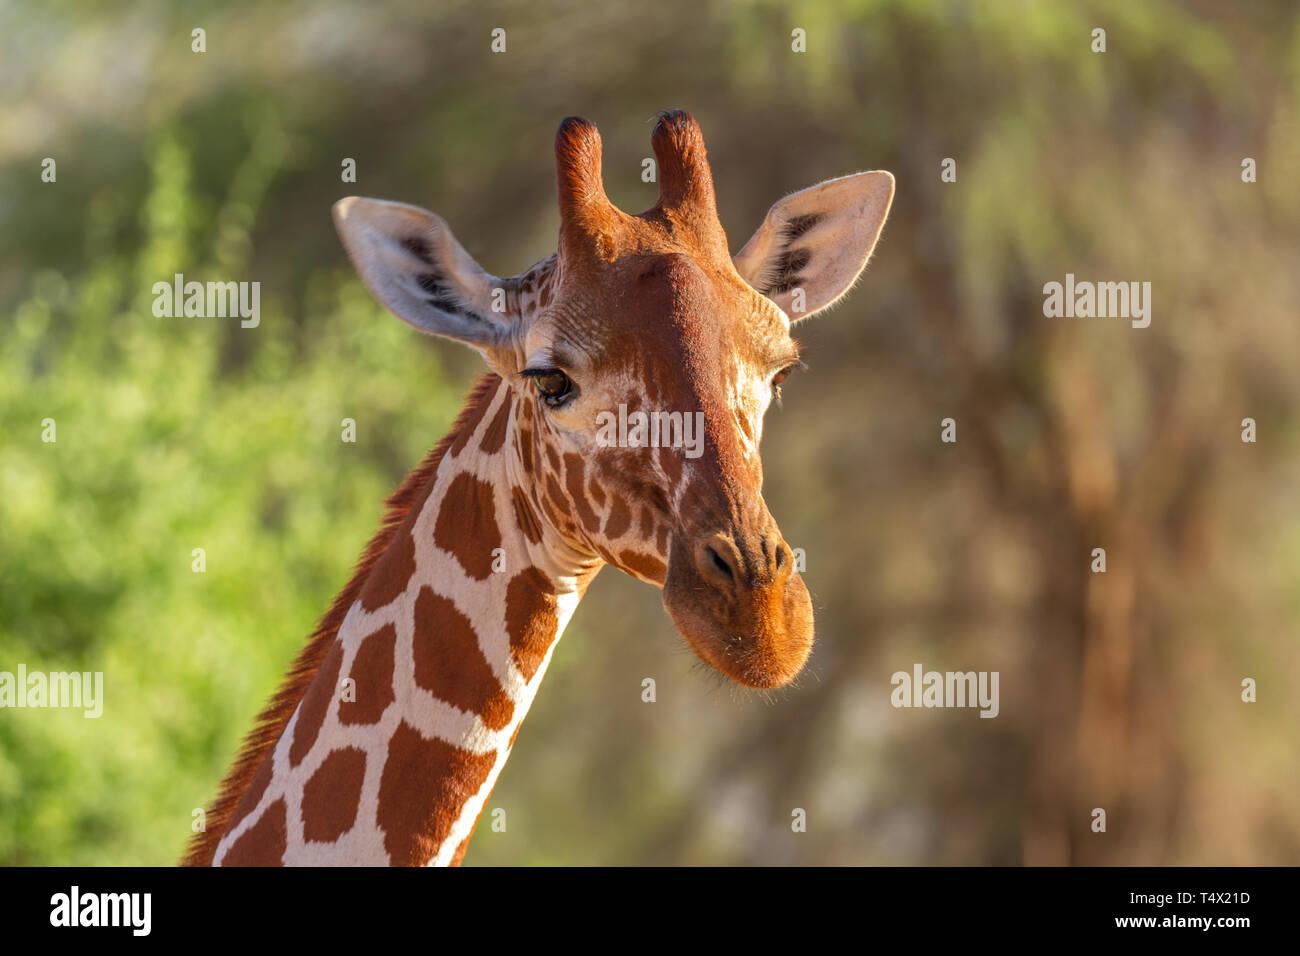 Les Girafes Giraffa camelopardalis reticulata réticulée de la réserve nationale de Samburu, Kenya Afrique de l'Est Banque D'Images